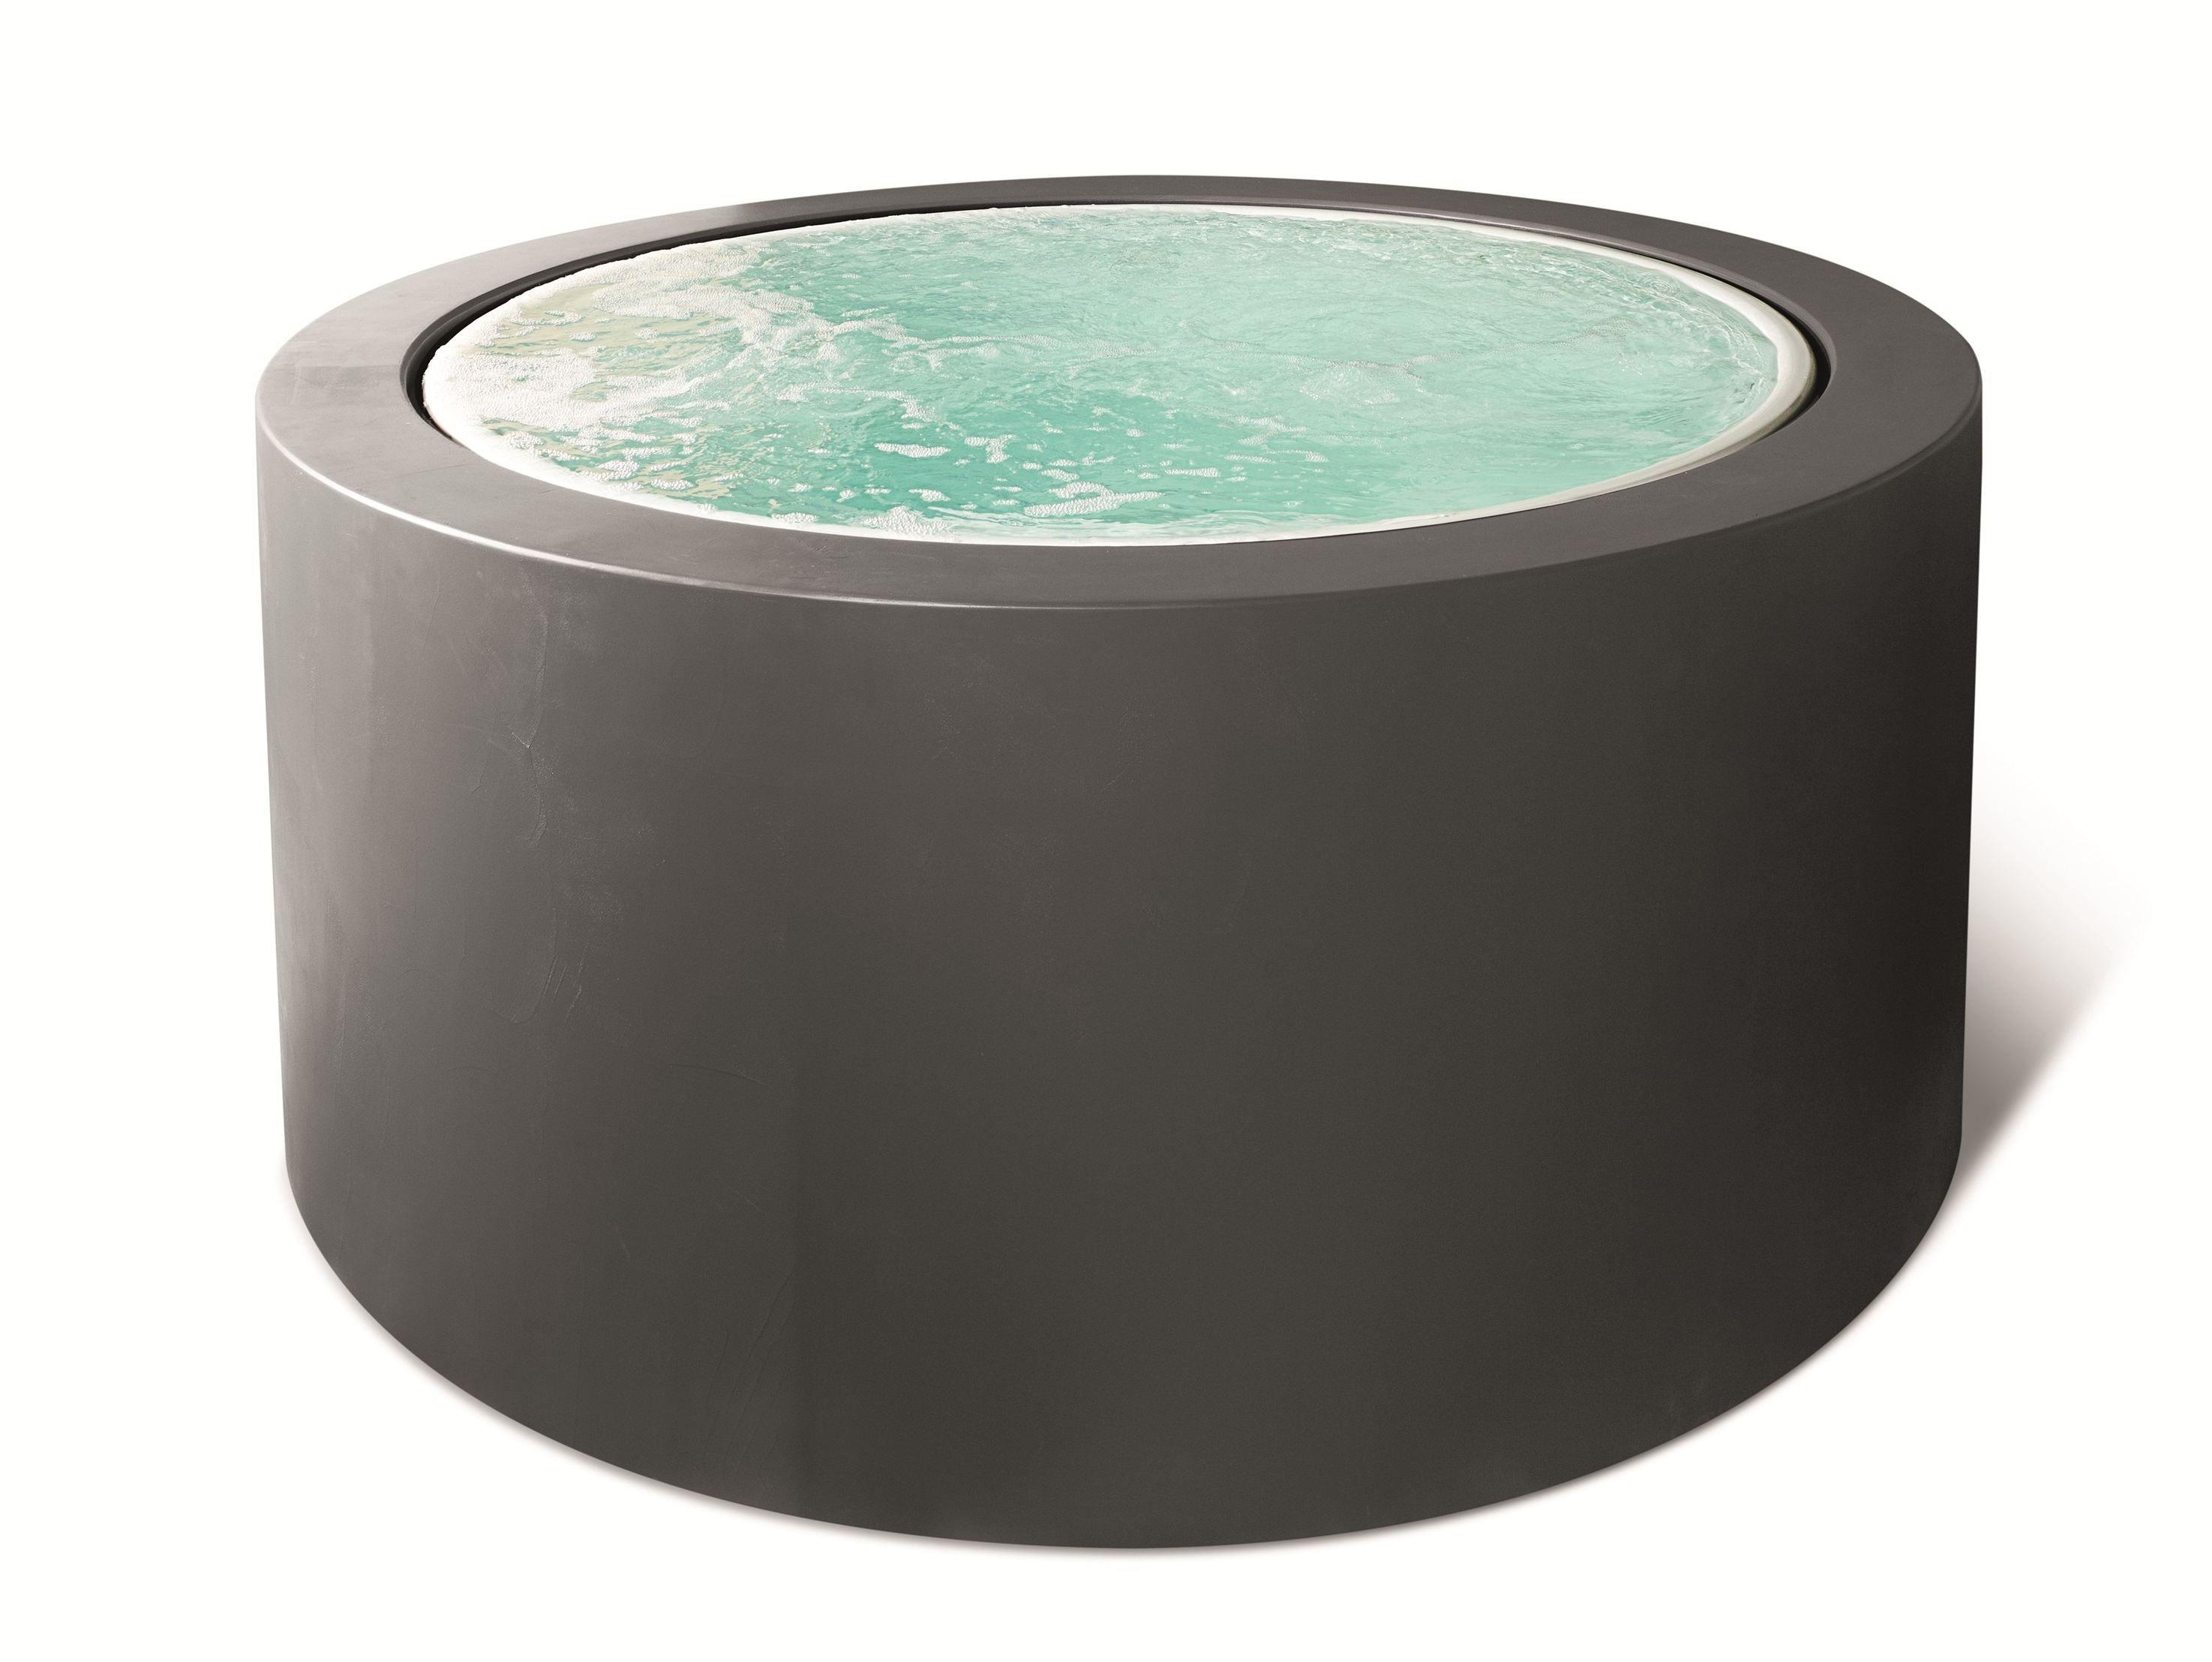 MINIPOOL Hot tub 5 seats by Kos by Zucchetti design Ludovica